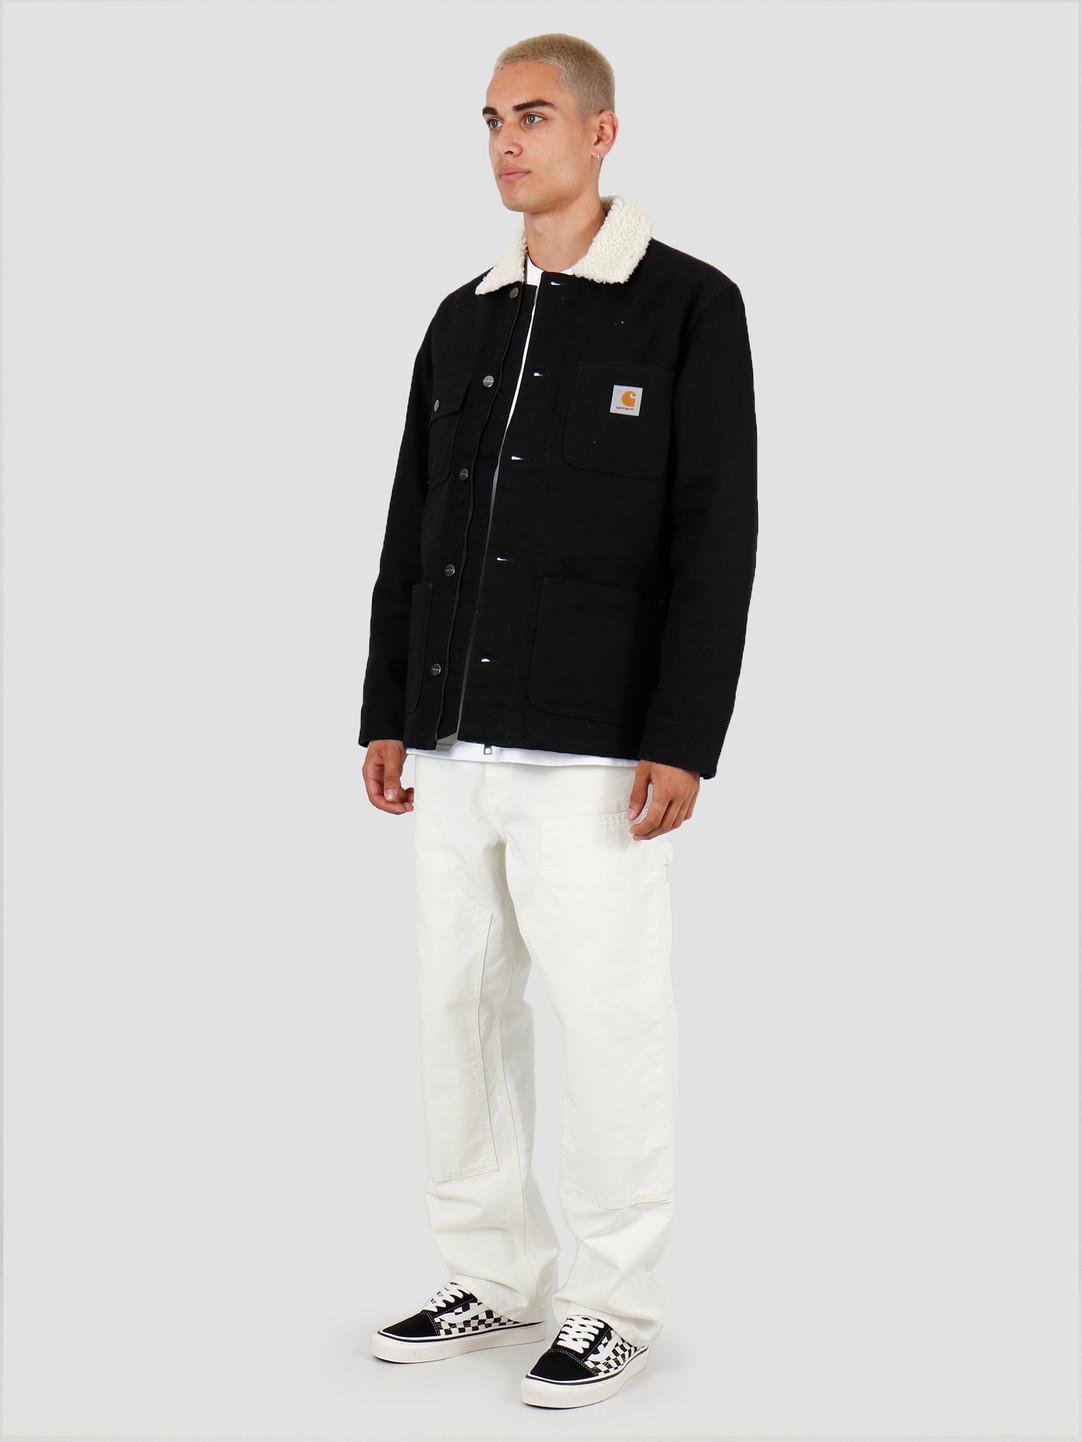 Carhartt WIP Carhartt WIP Phoenix Coat Black I025444-8900